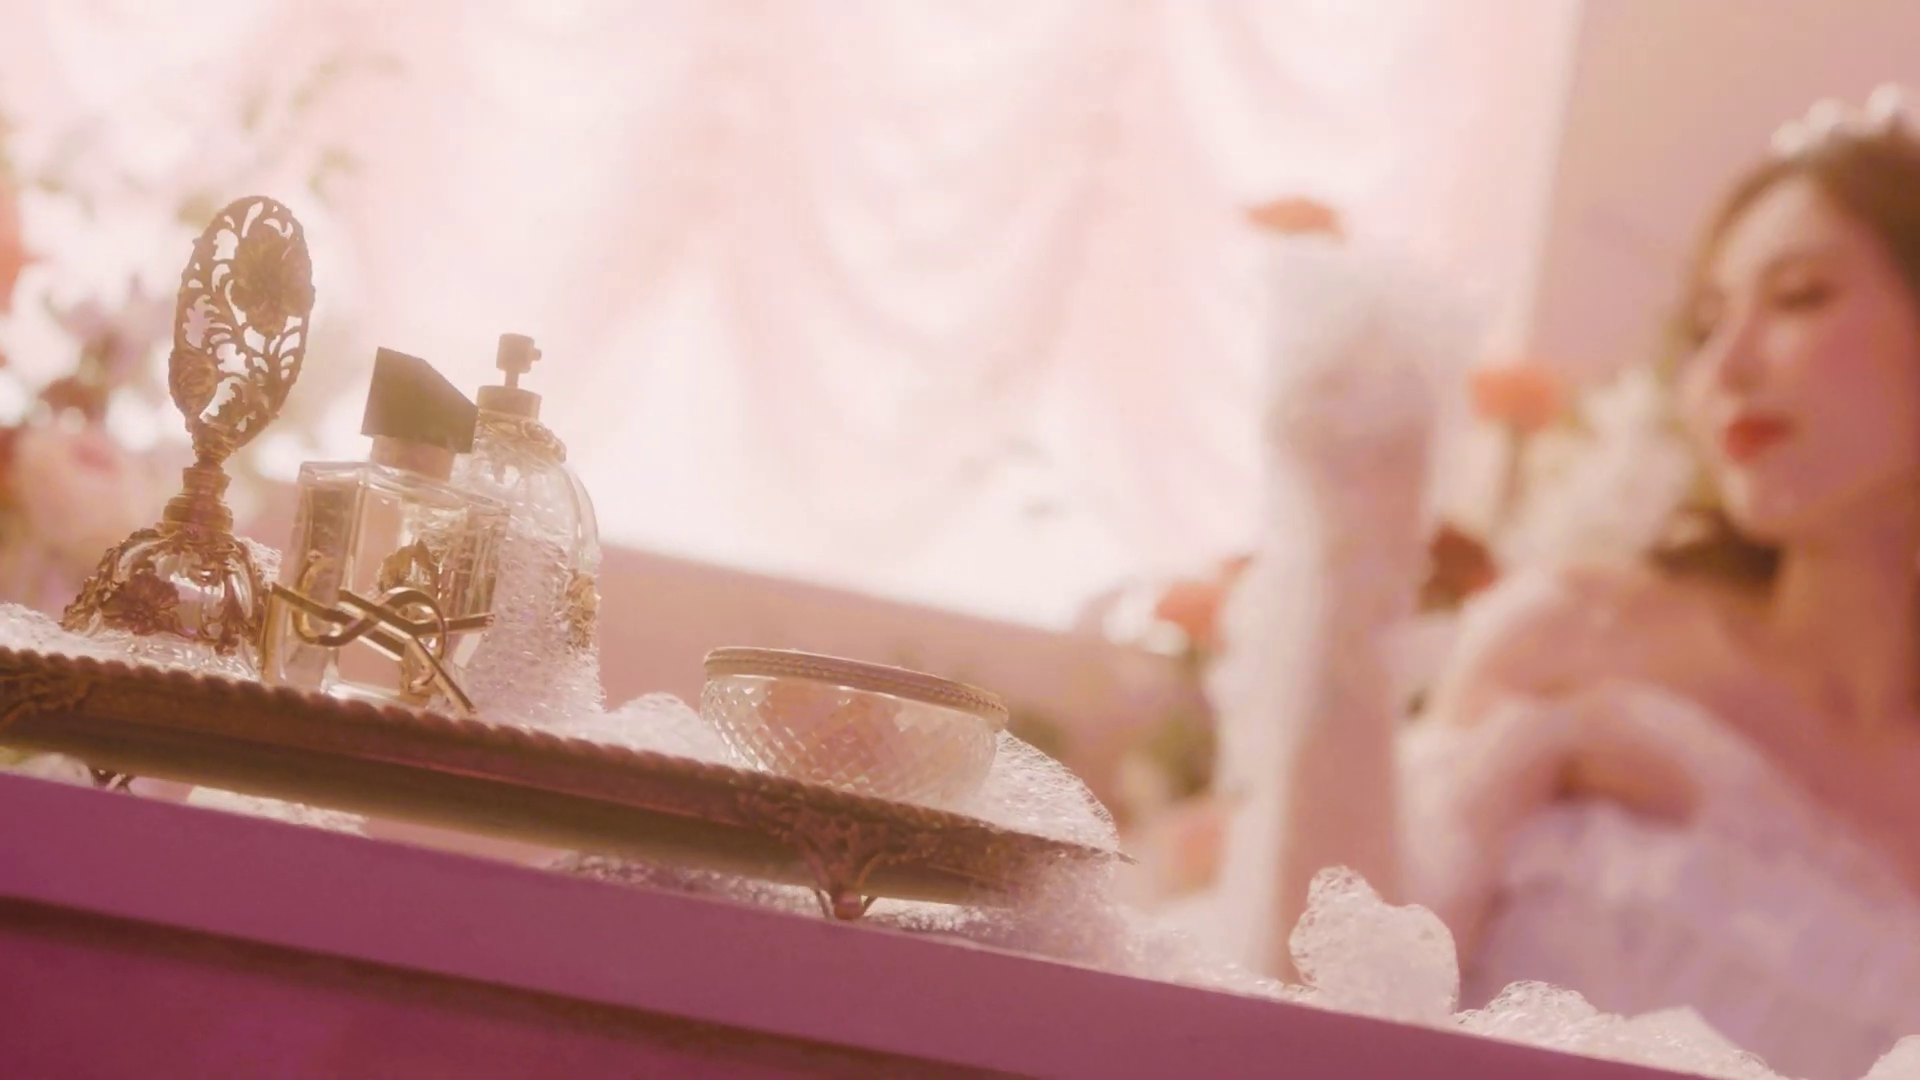 hyuna flower shower, hyuna flower shower makeup, hyuna 2019 comeback